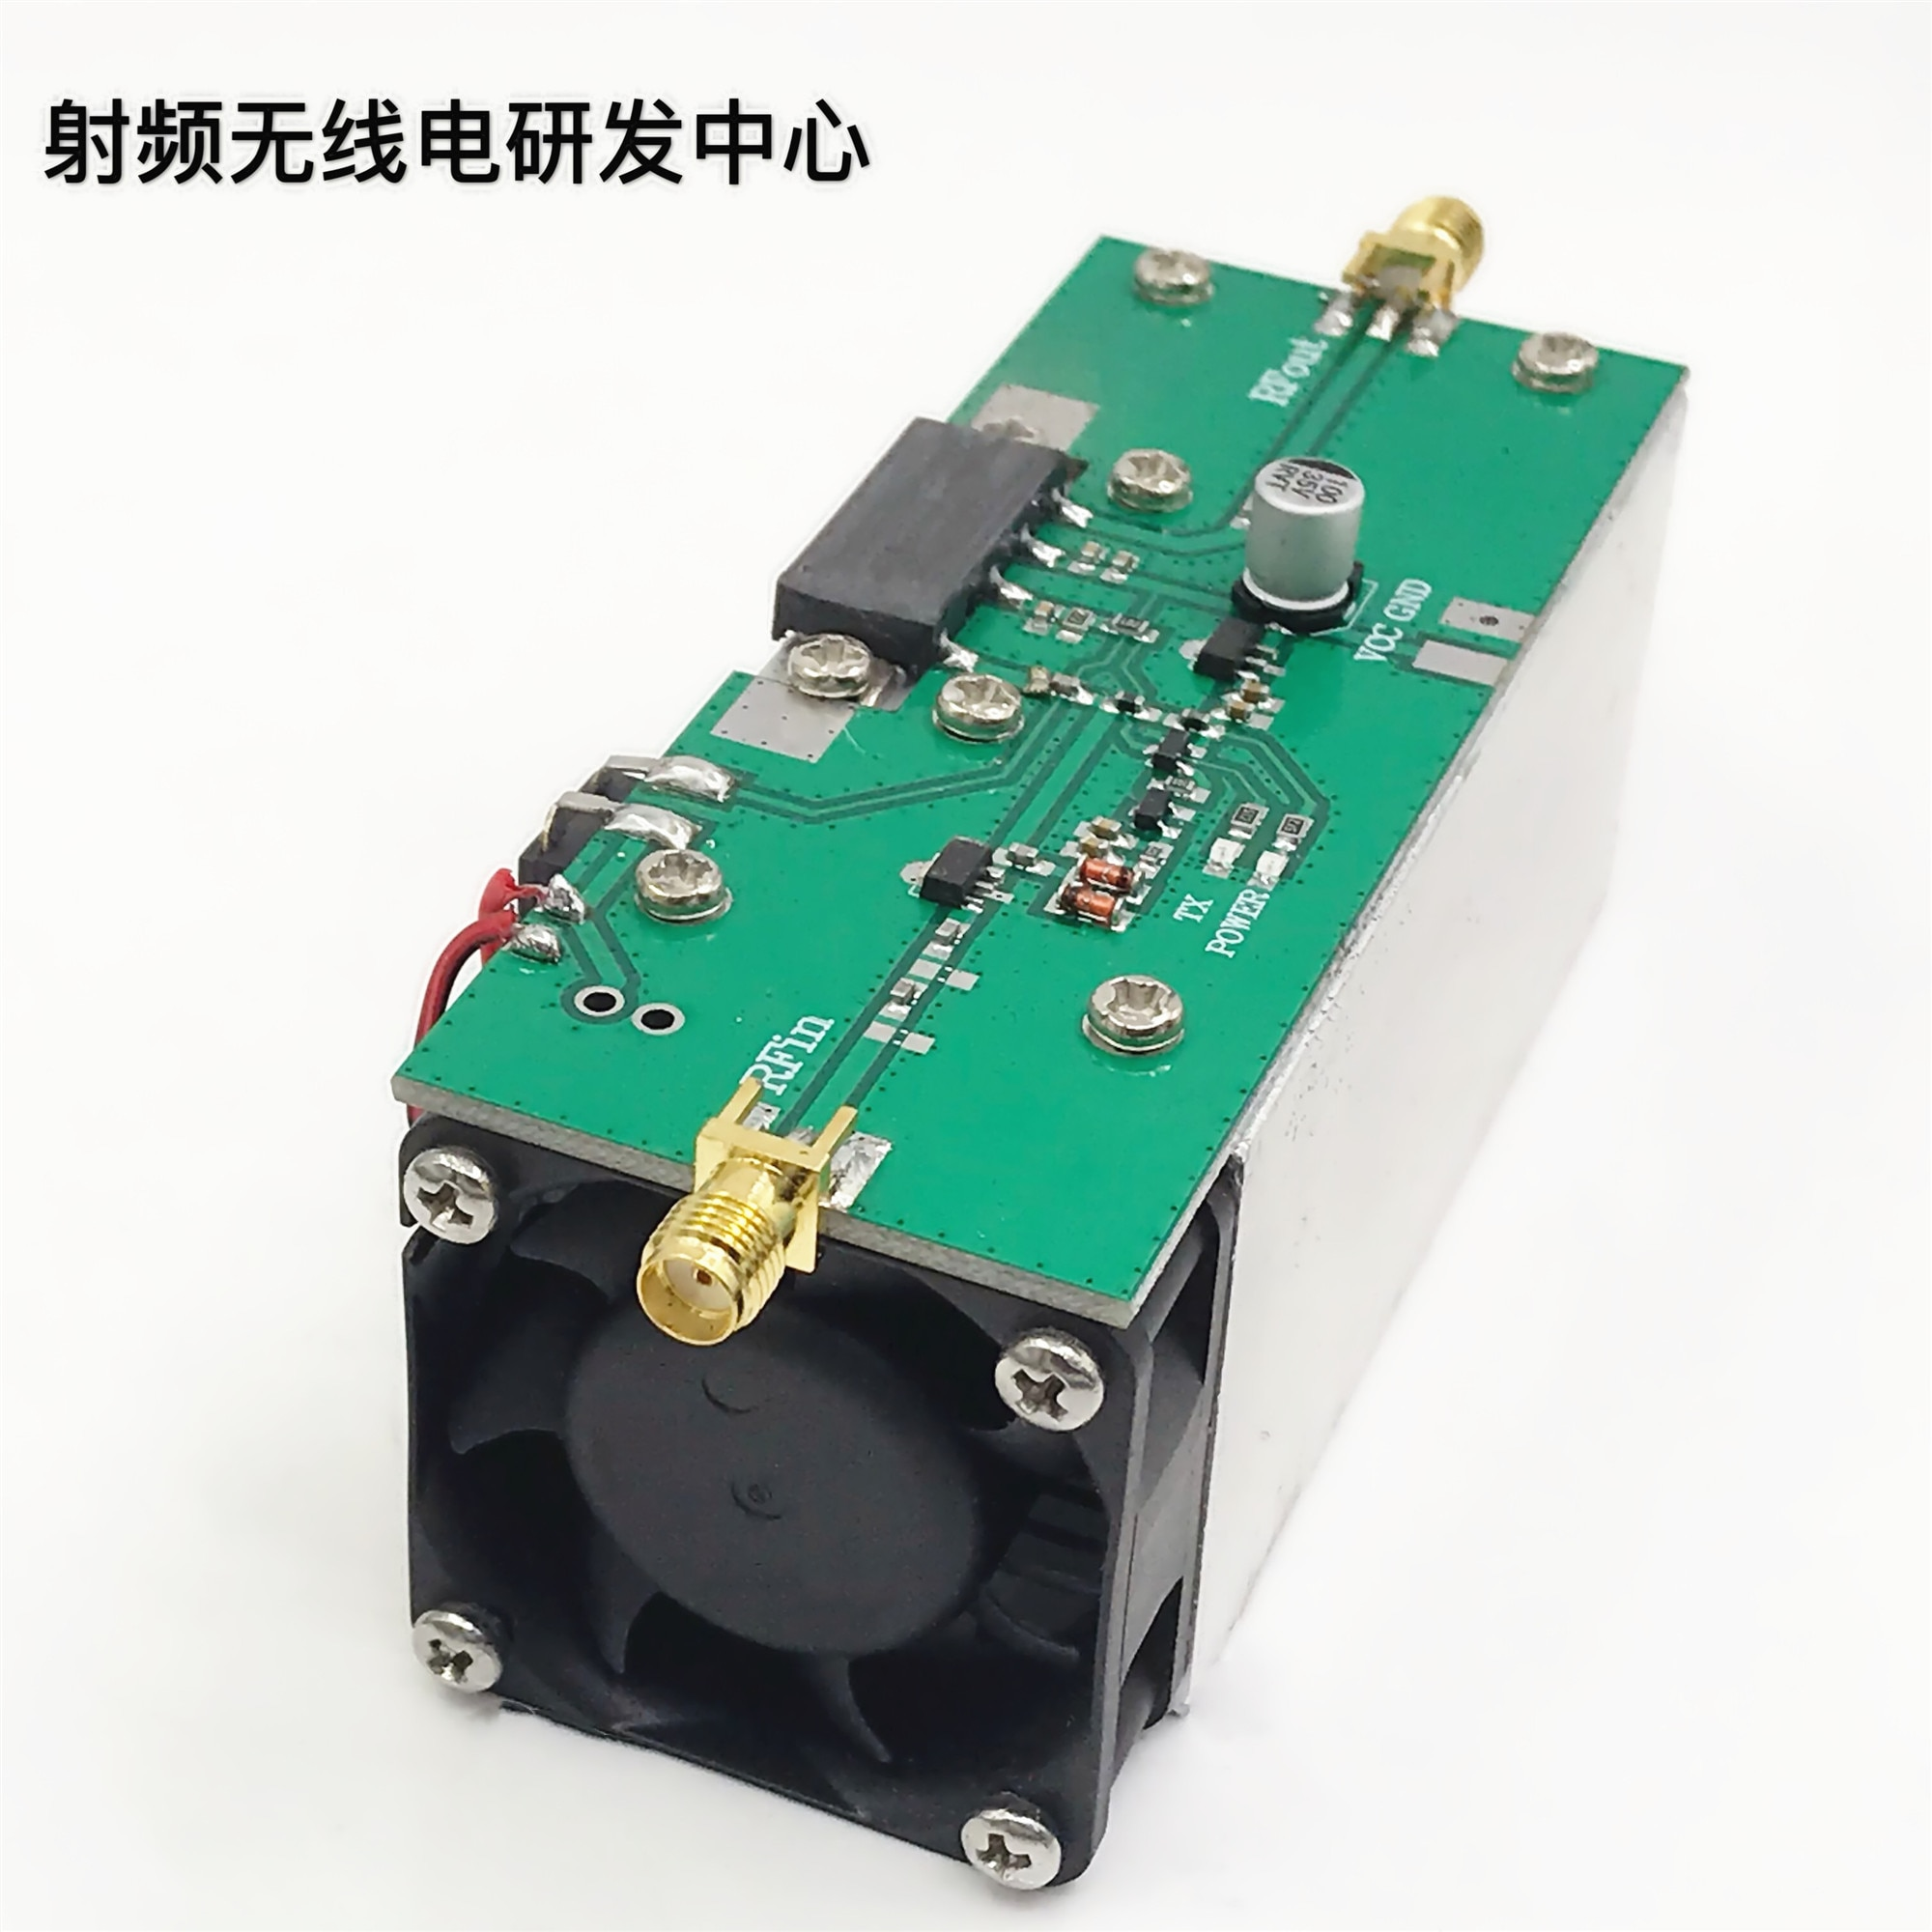 مضخم طاقة تردد راديو 433 ميجا هرتز (13 واط) ، مضخم طاقة 335-480 ميجا هرتز